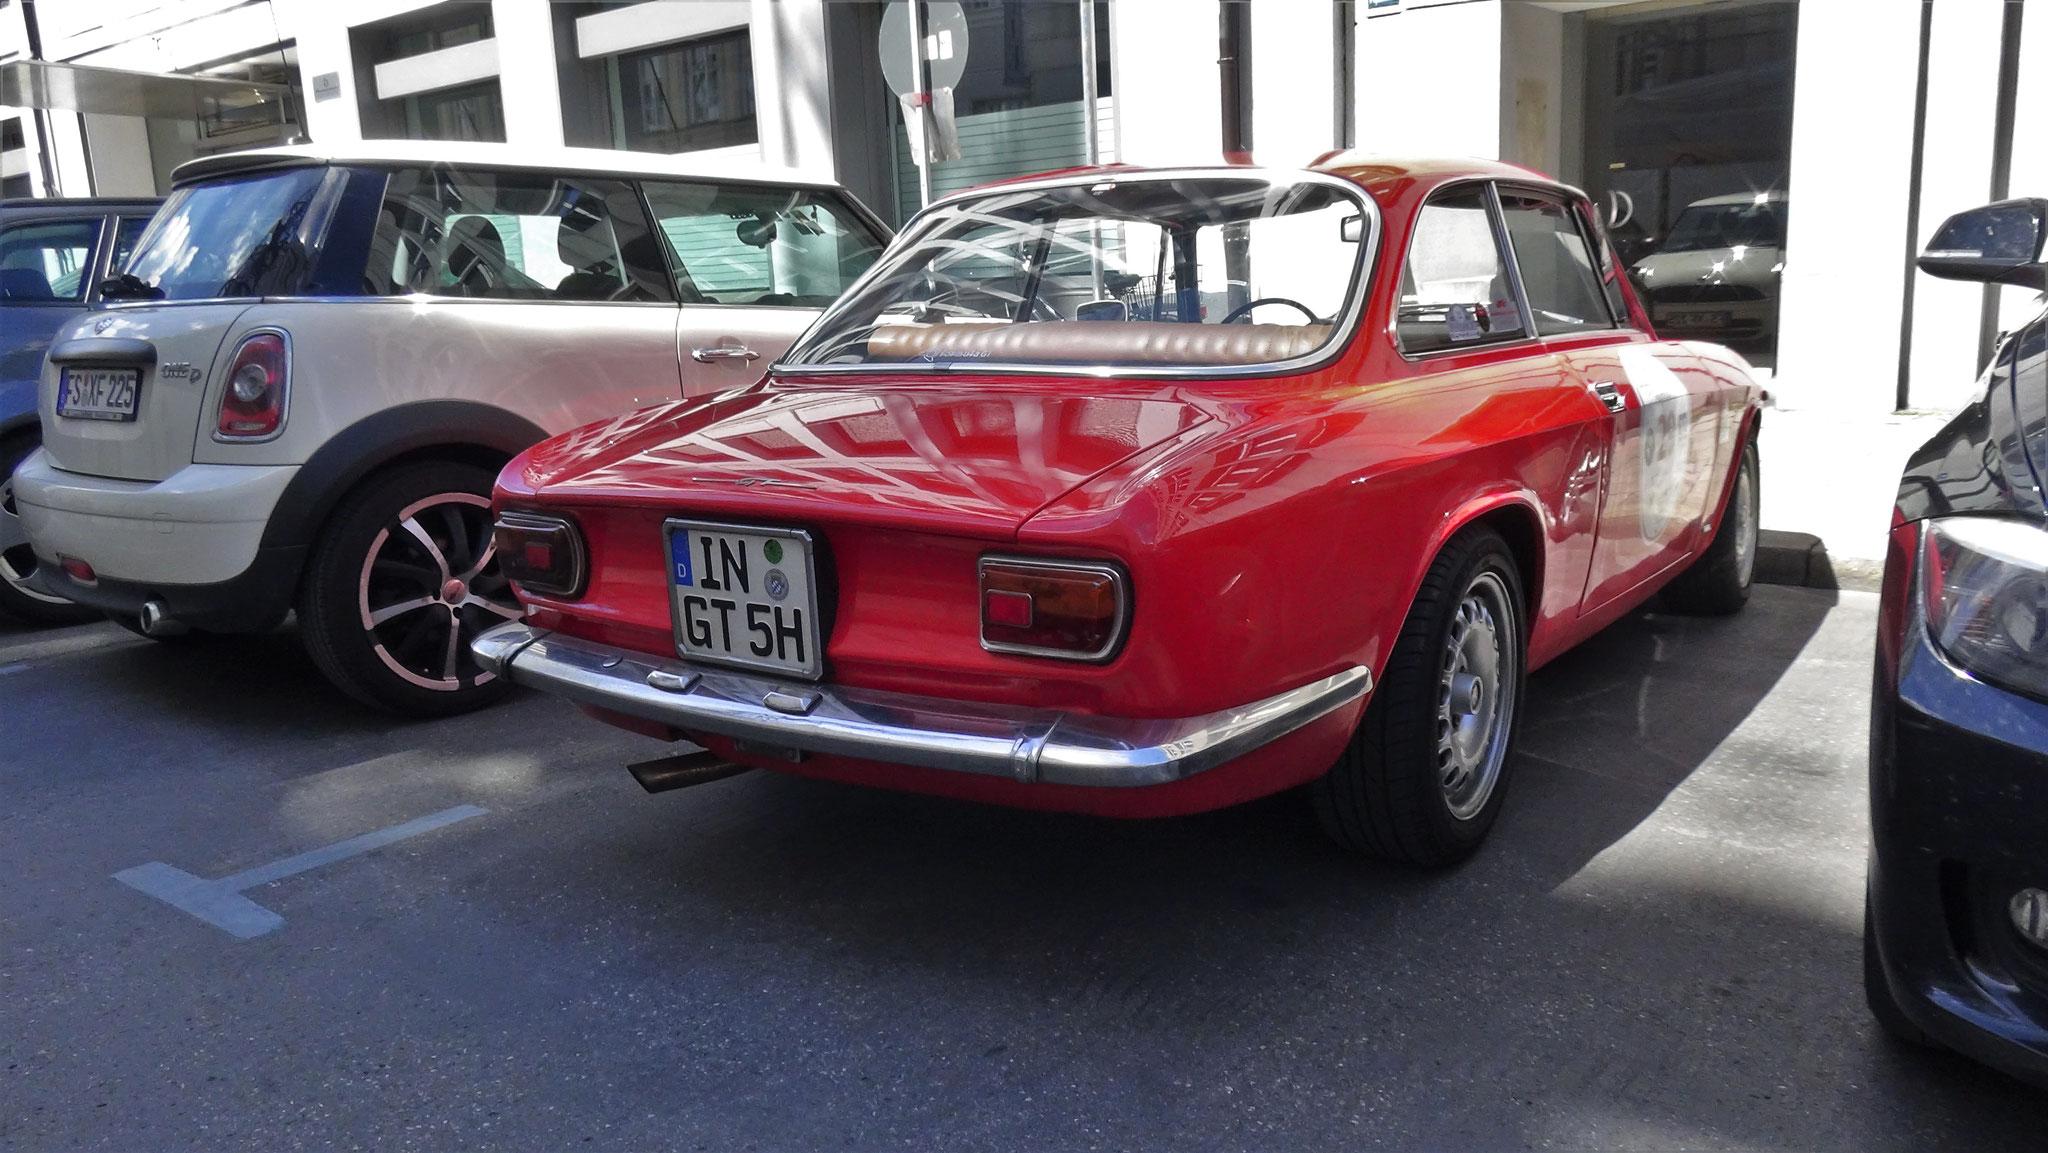 Alfa Romeo Giulia Sprint GT - IN-GT-5H